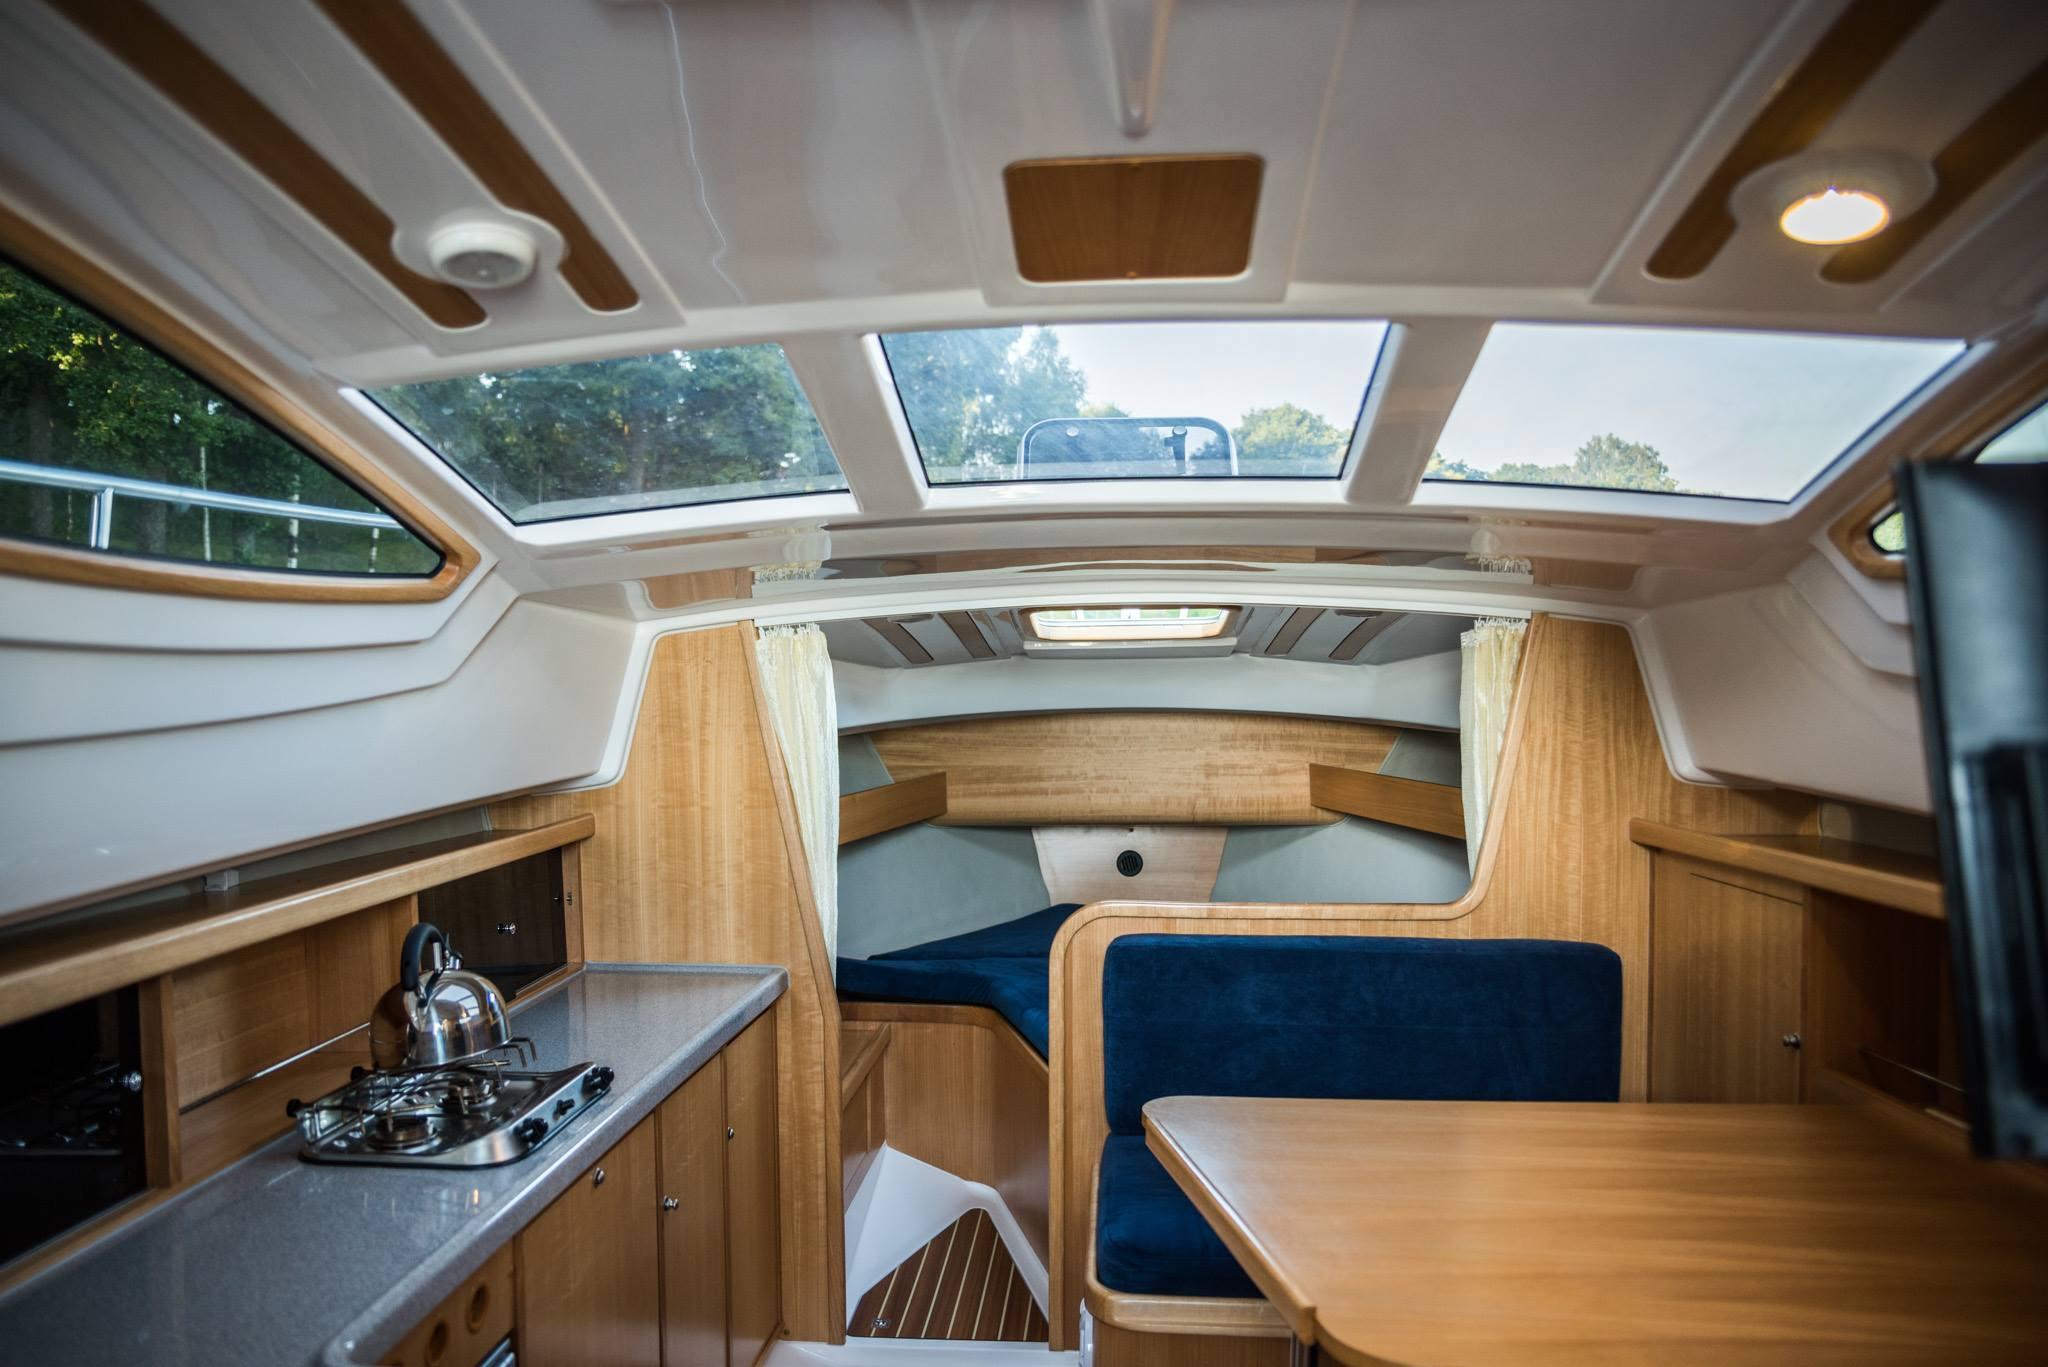 kabina houseboat